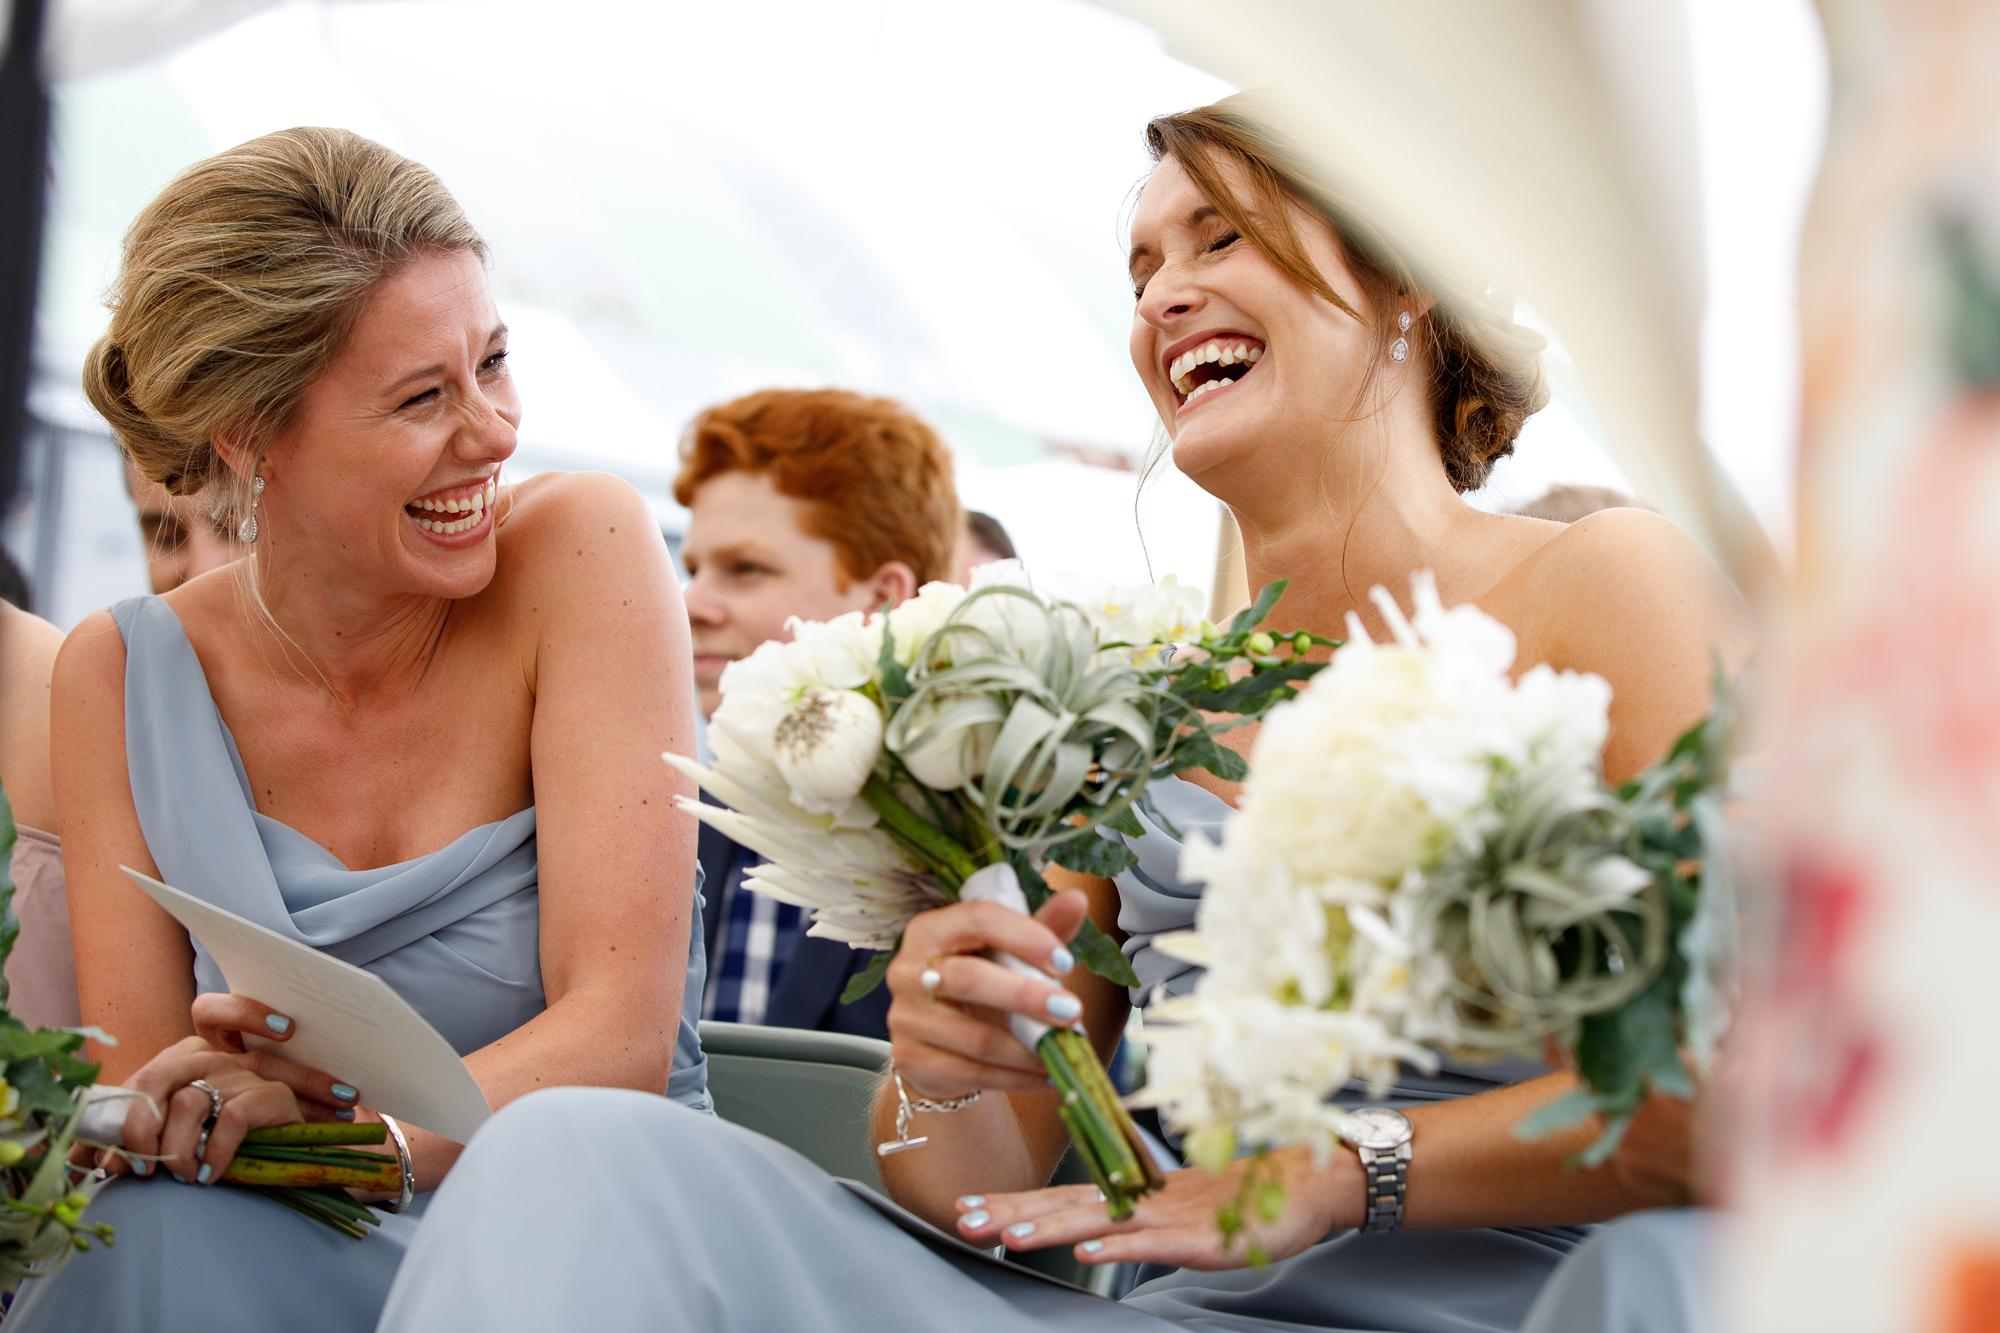 A.P Bloem wedding bruiloft florist Amsterdam flowers bloemen trouwen bloemen bloemenwinkel white tropical bride bruidsboeket bride bouquet bruiloft hangar noord event evenement tropical bride bruid groom bruidgrom bridesmaids